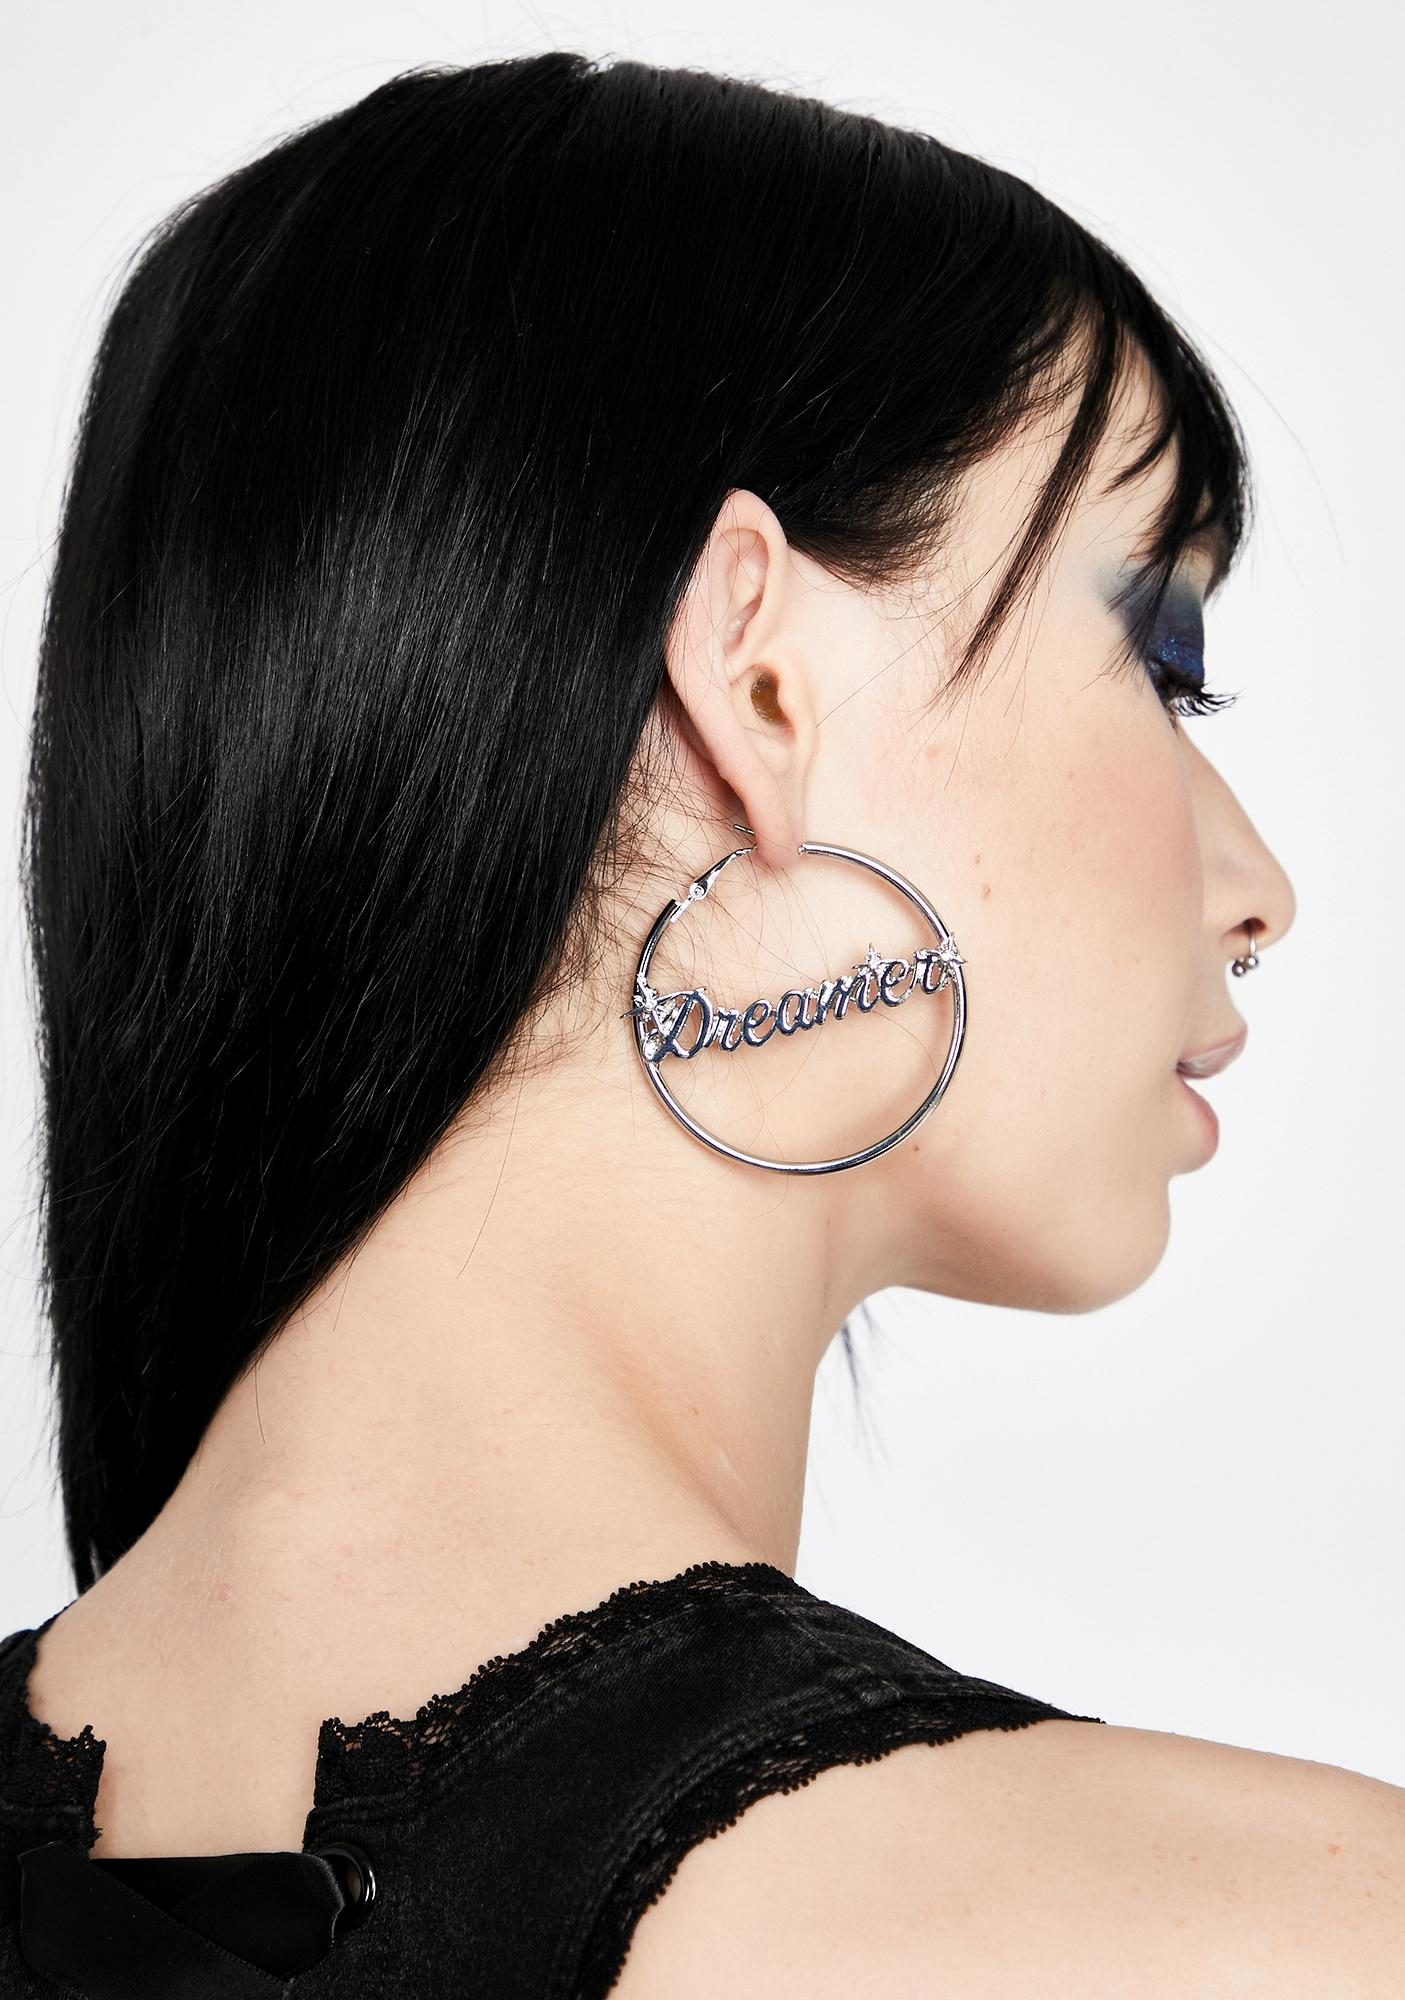 Lost In Thought Hoop Earrings